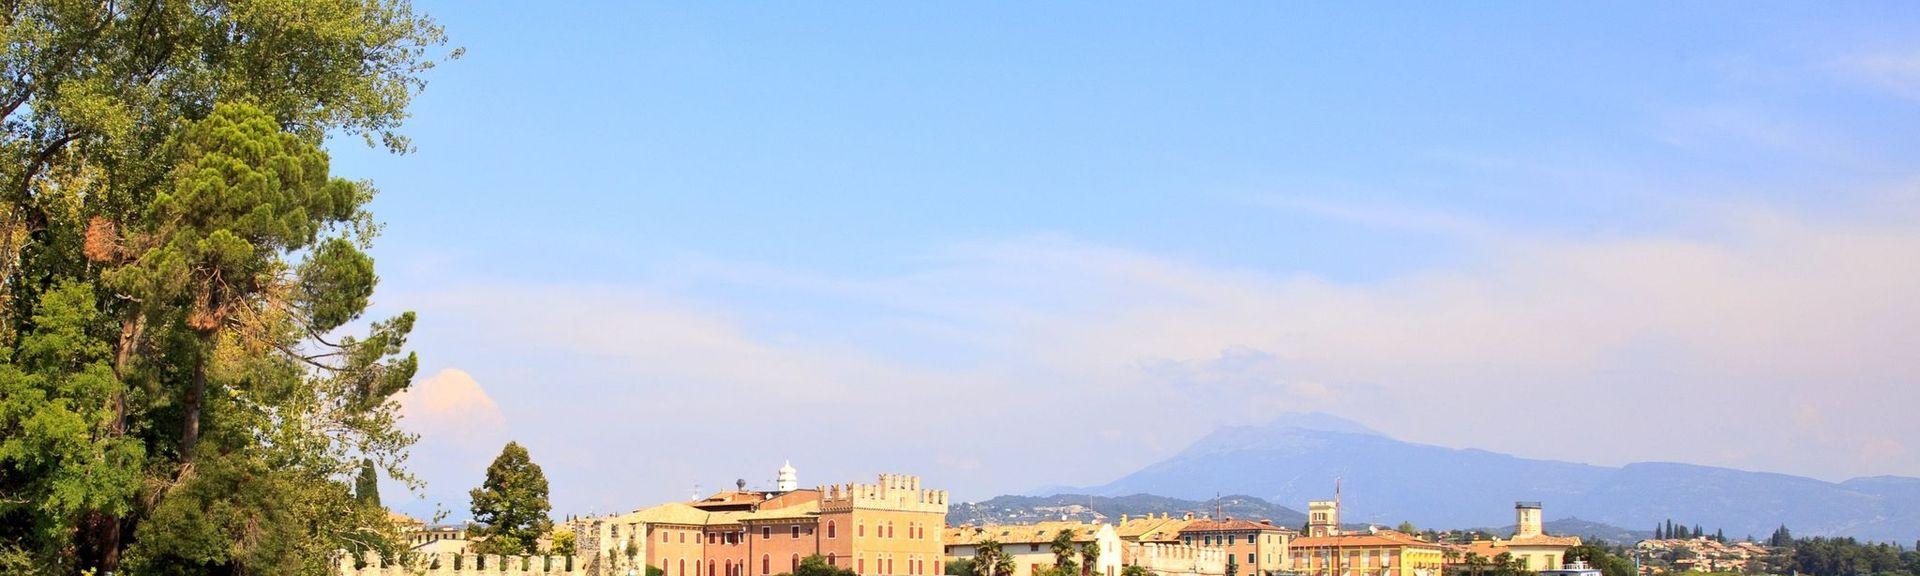 Caprino Veronese, Vénétie, Italie